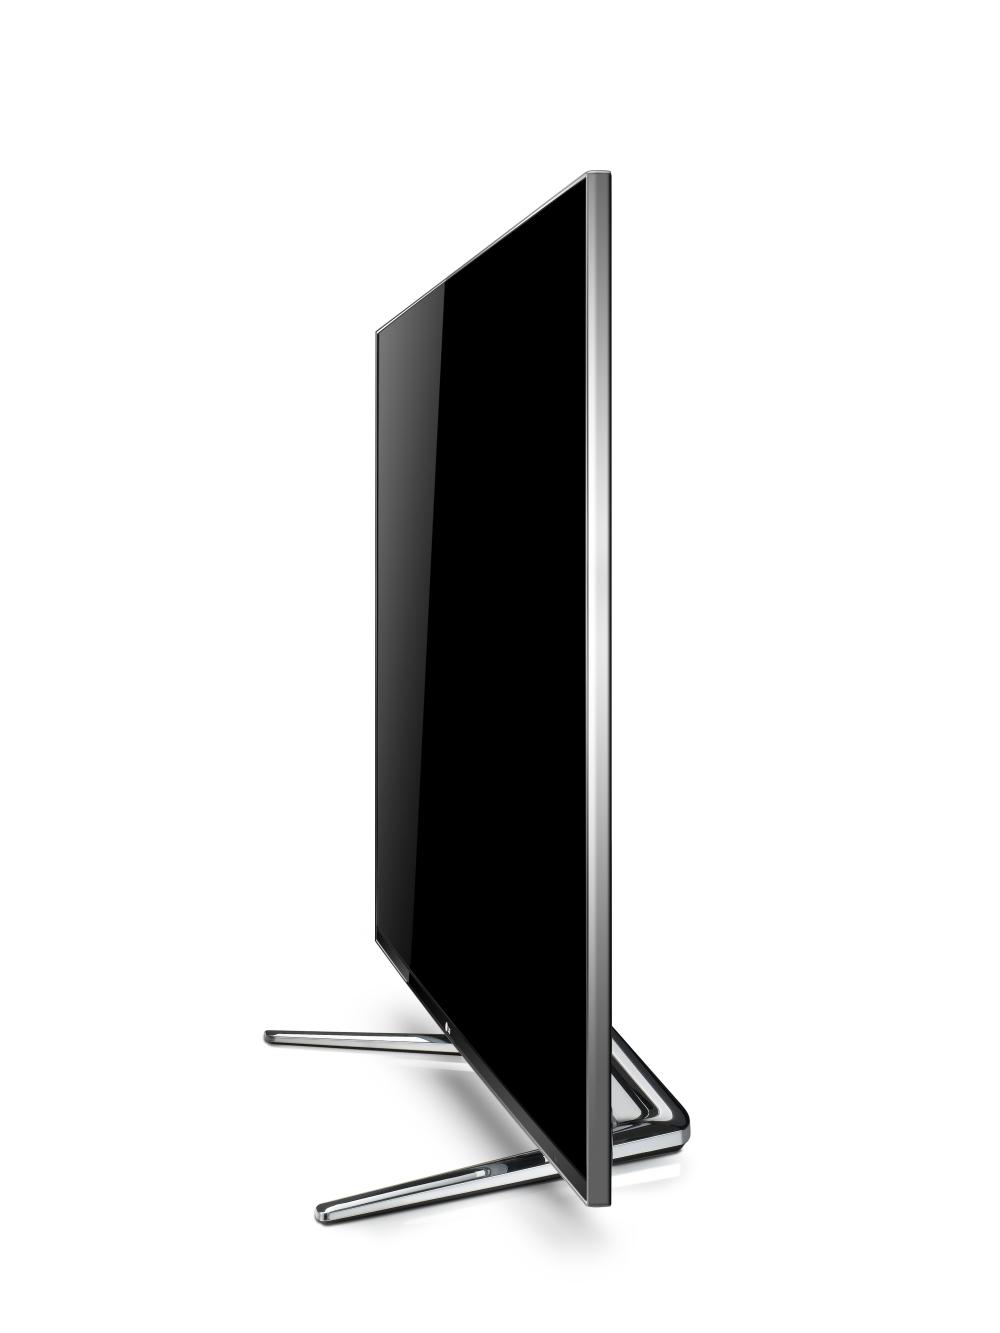 LG LM960V 3D-TV (Seitenansicht)